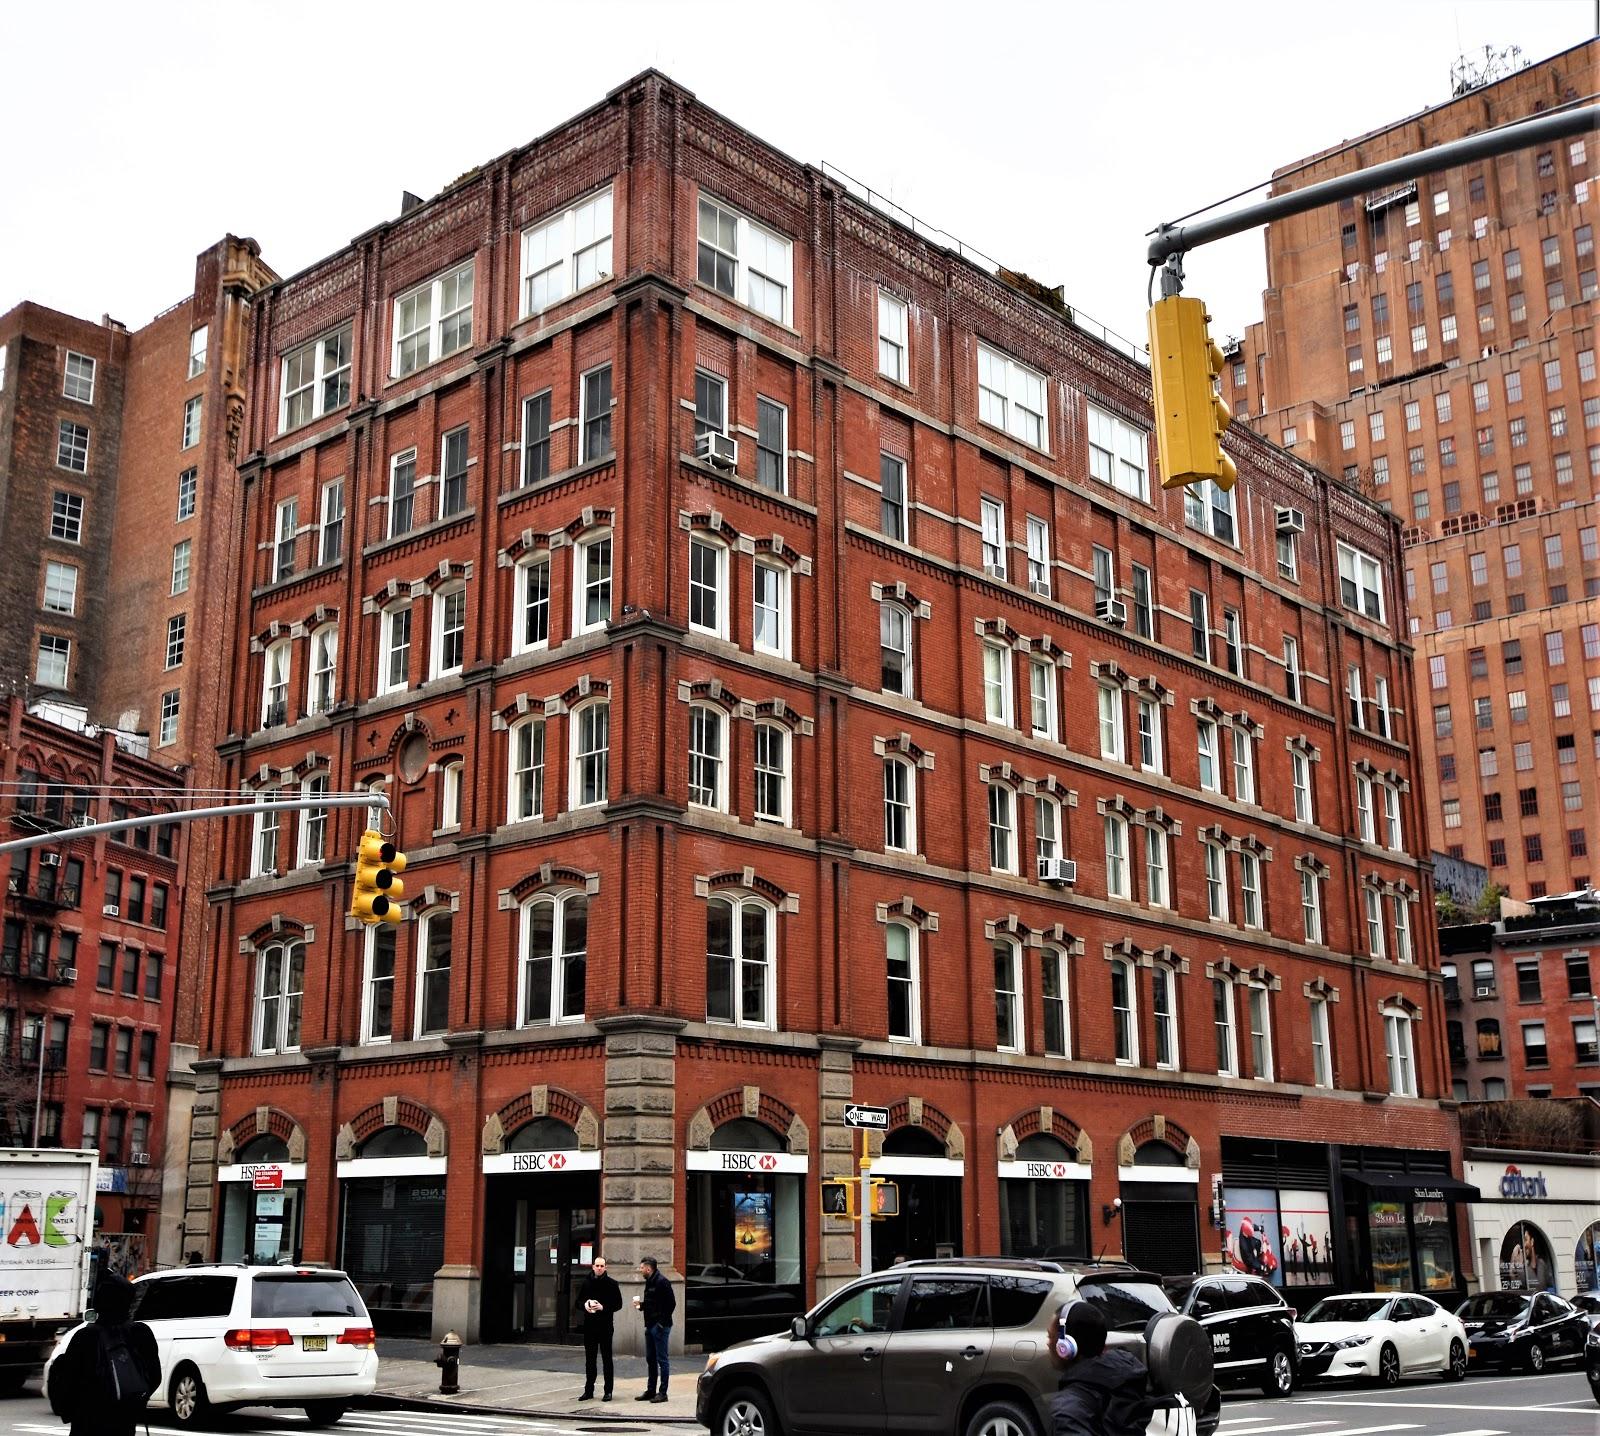 Manhattan Streets: Daytonian In Manhattan: The Thurber, Whyland & Co. Bldg